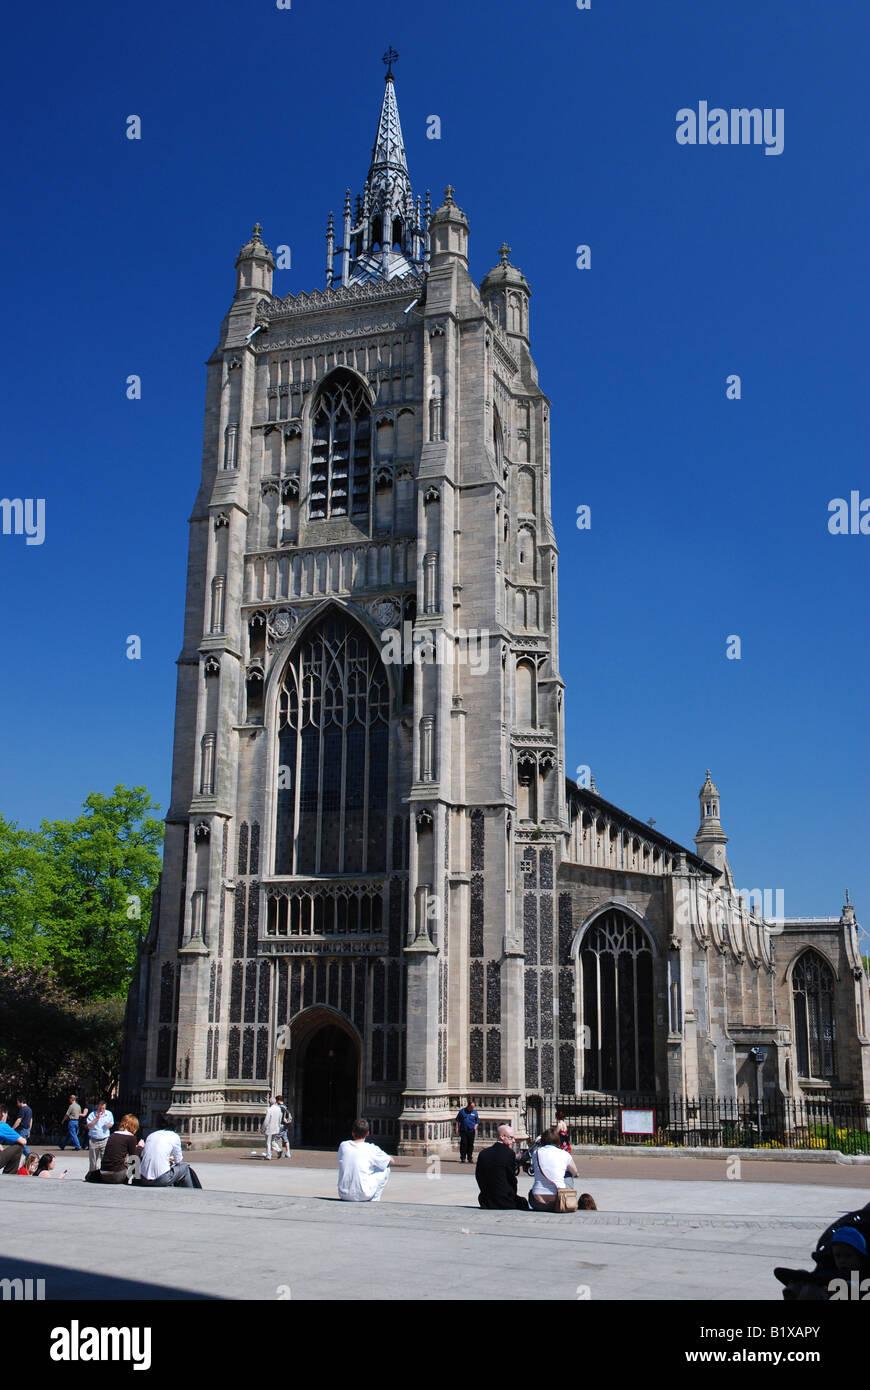 St Peter Mancroft Church and Millenium Plain, Norwich, Norfolk - Stock Image